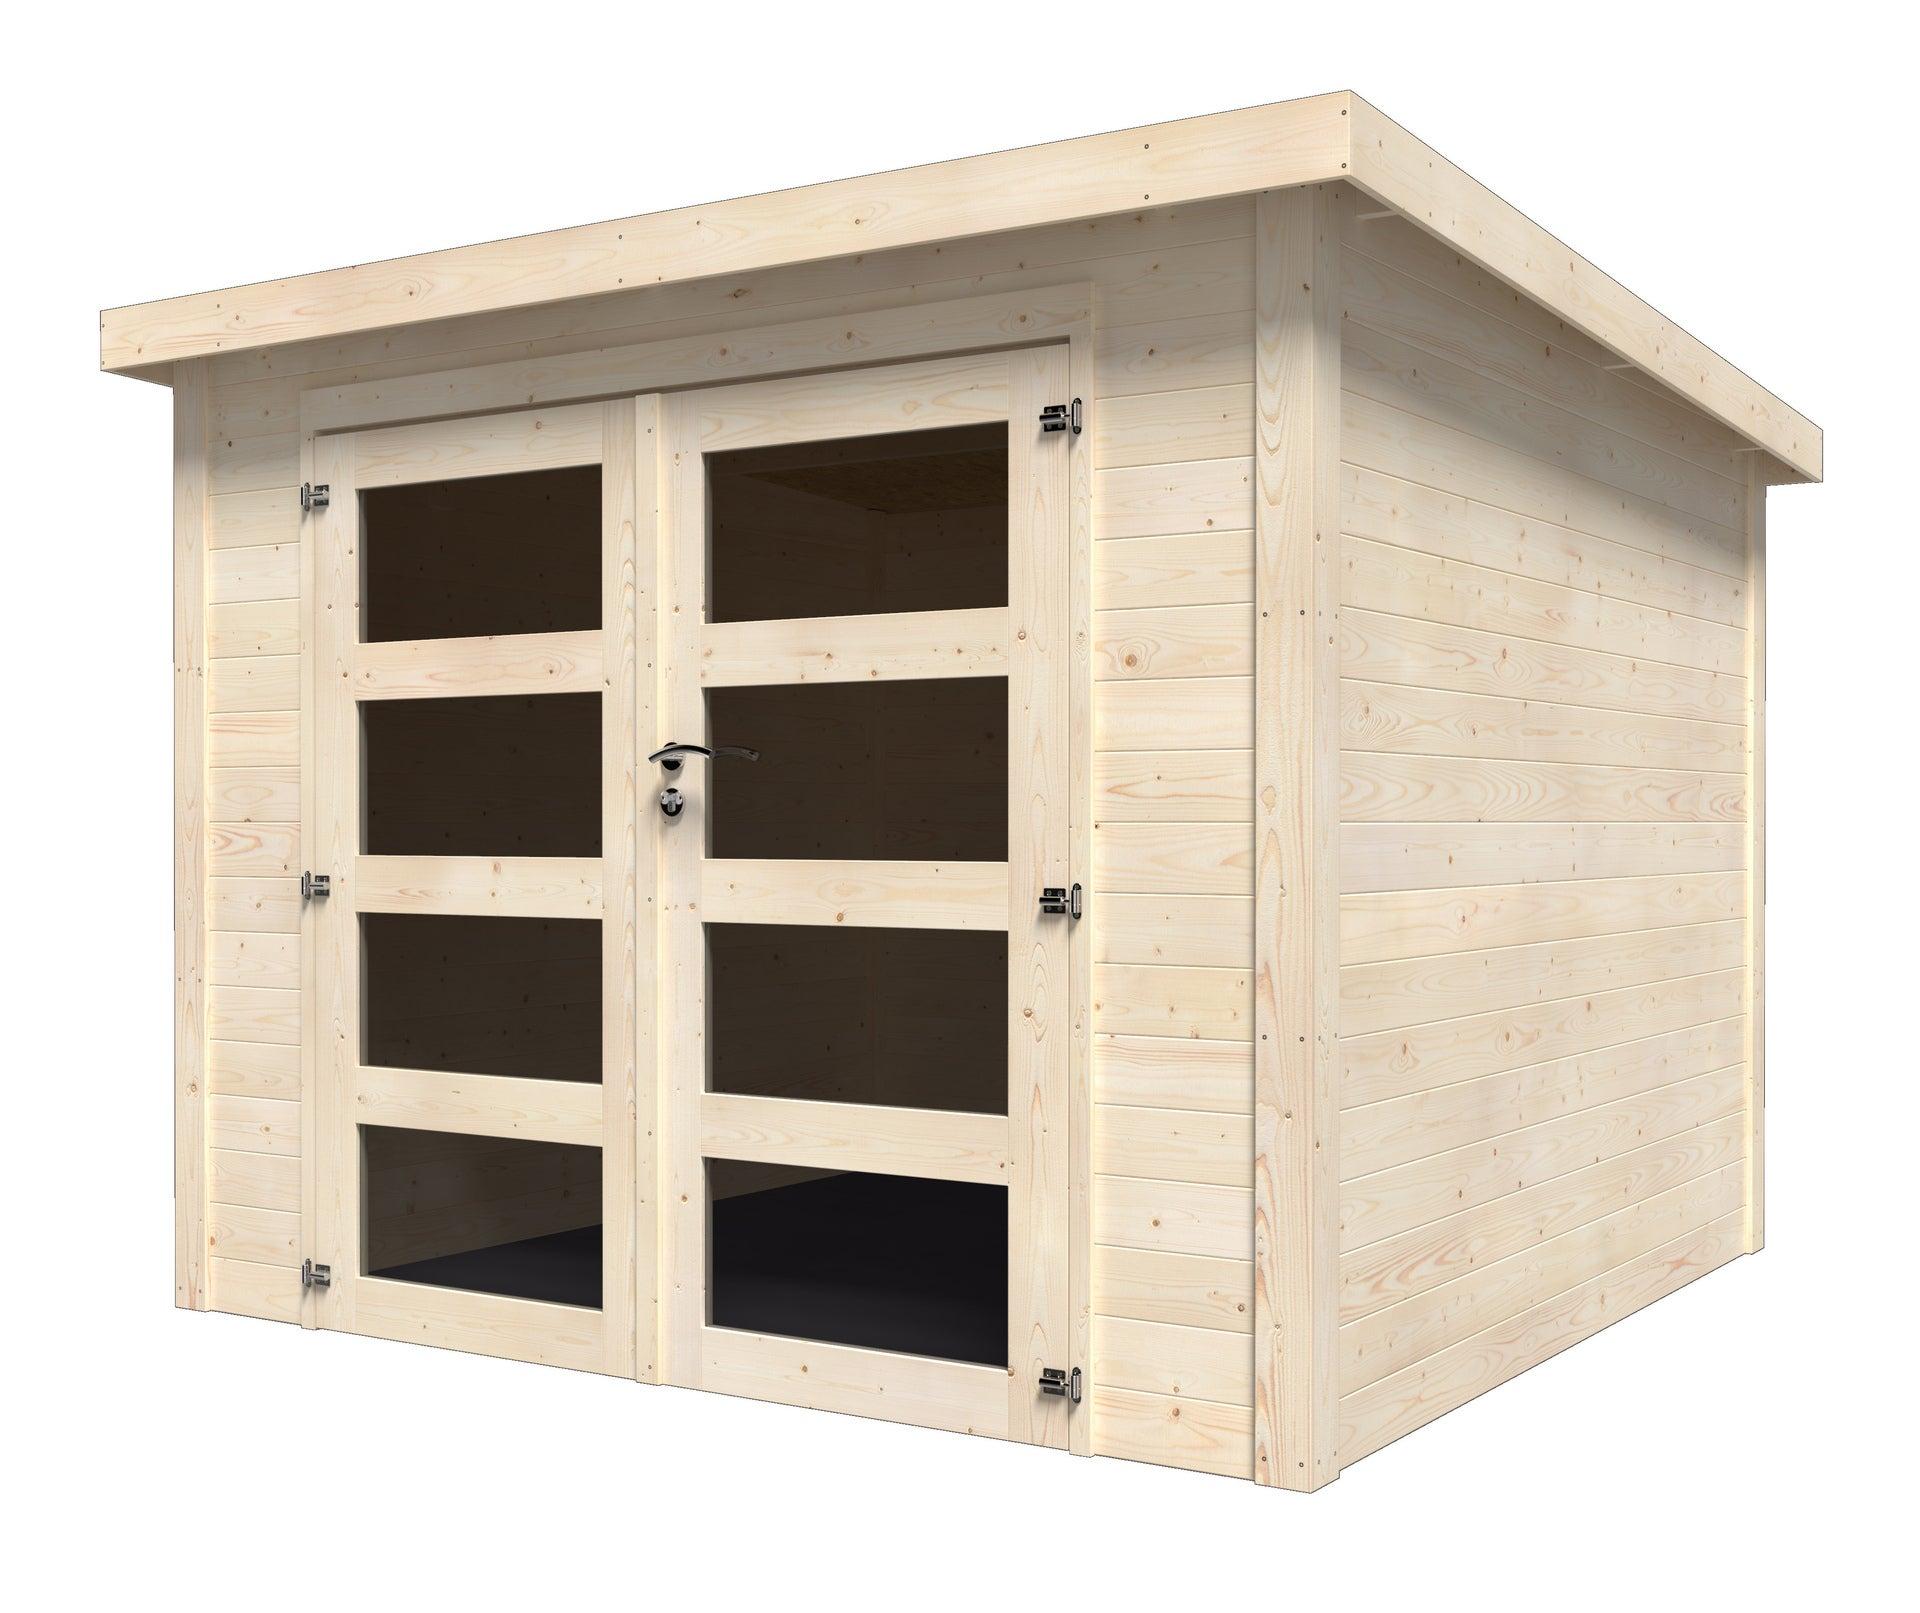 Abri de jardin bois NATERIAL Kuta axess Ep.8 mm, 8.8 m²